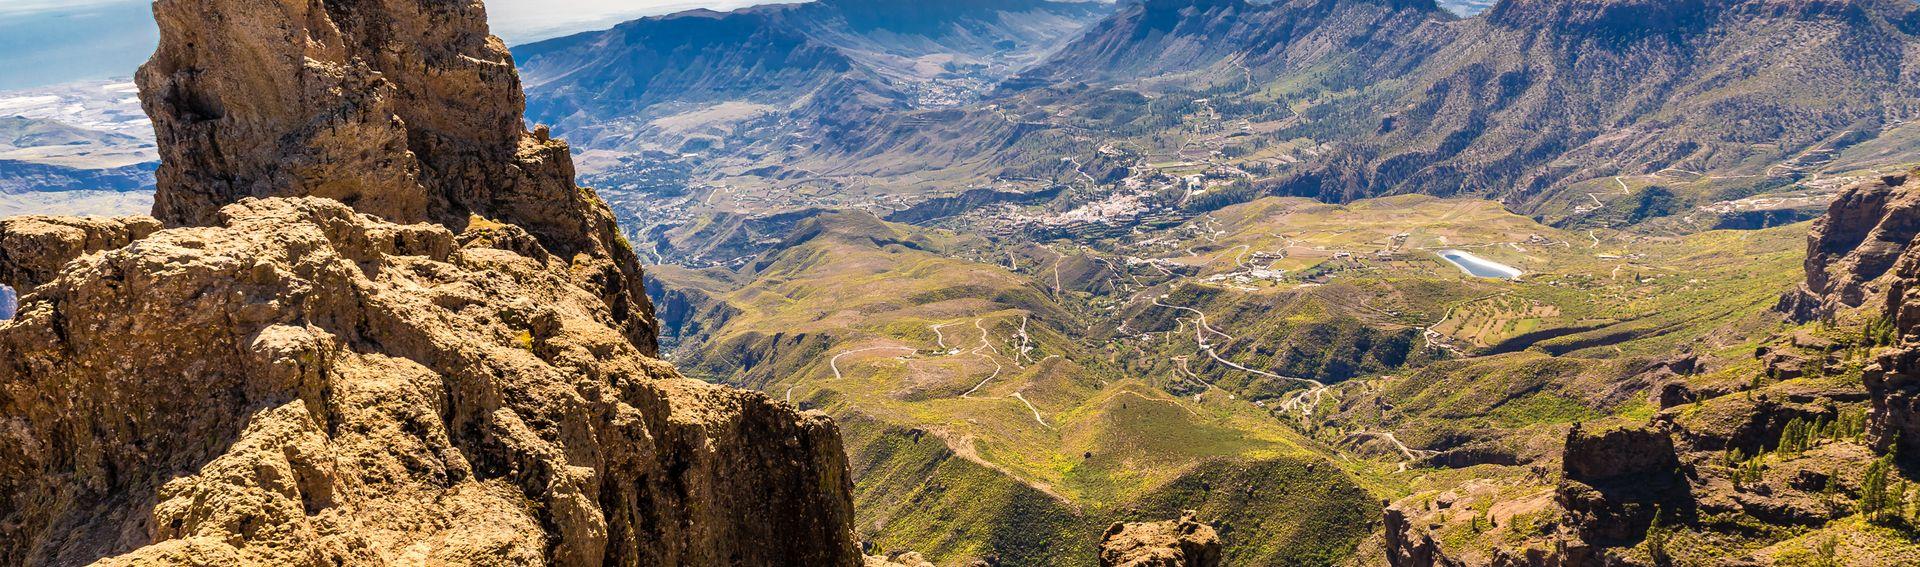 Gran Canaria Landesinneres